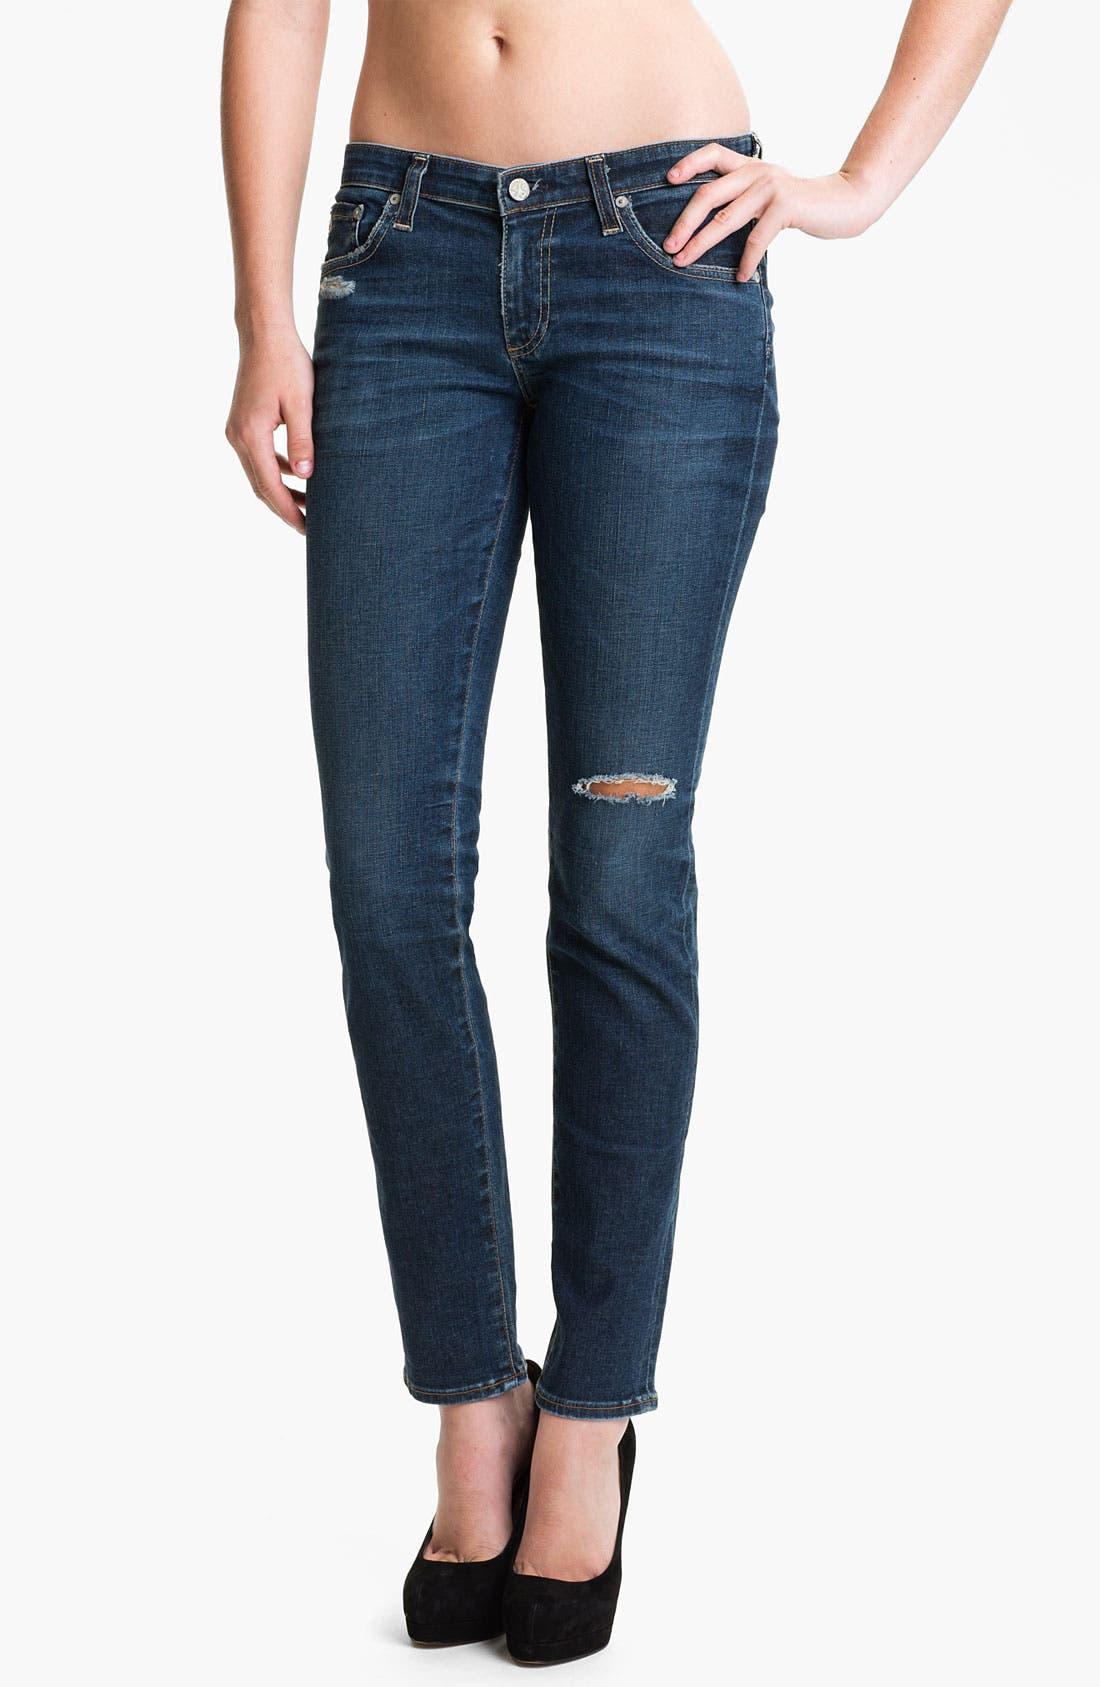 Main Image - AG Jeans 'The Stilt' Cigarette Leg Jeans (Six Year Rinse)